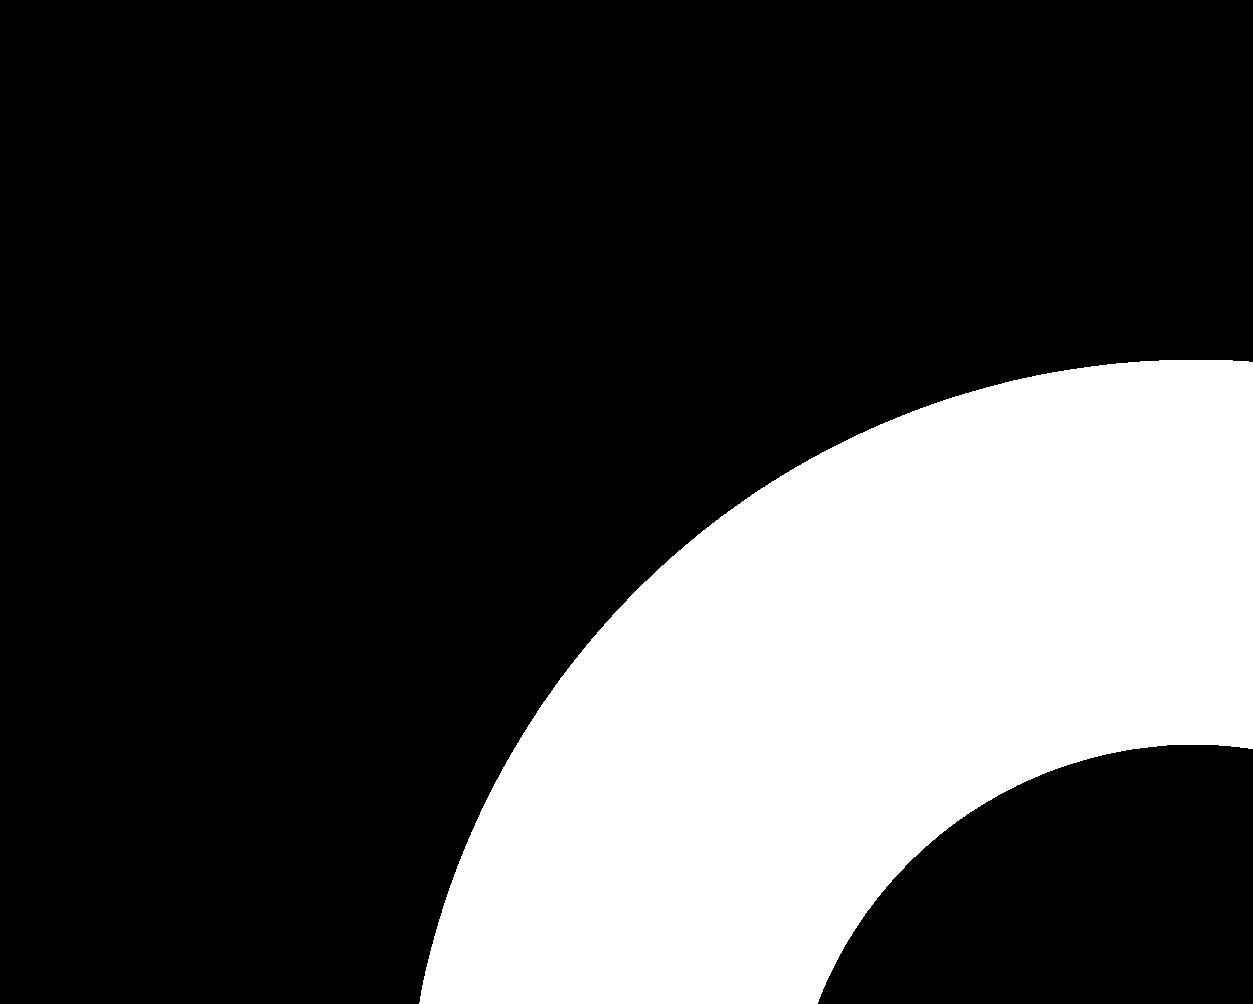 Decroative circle graphic